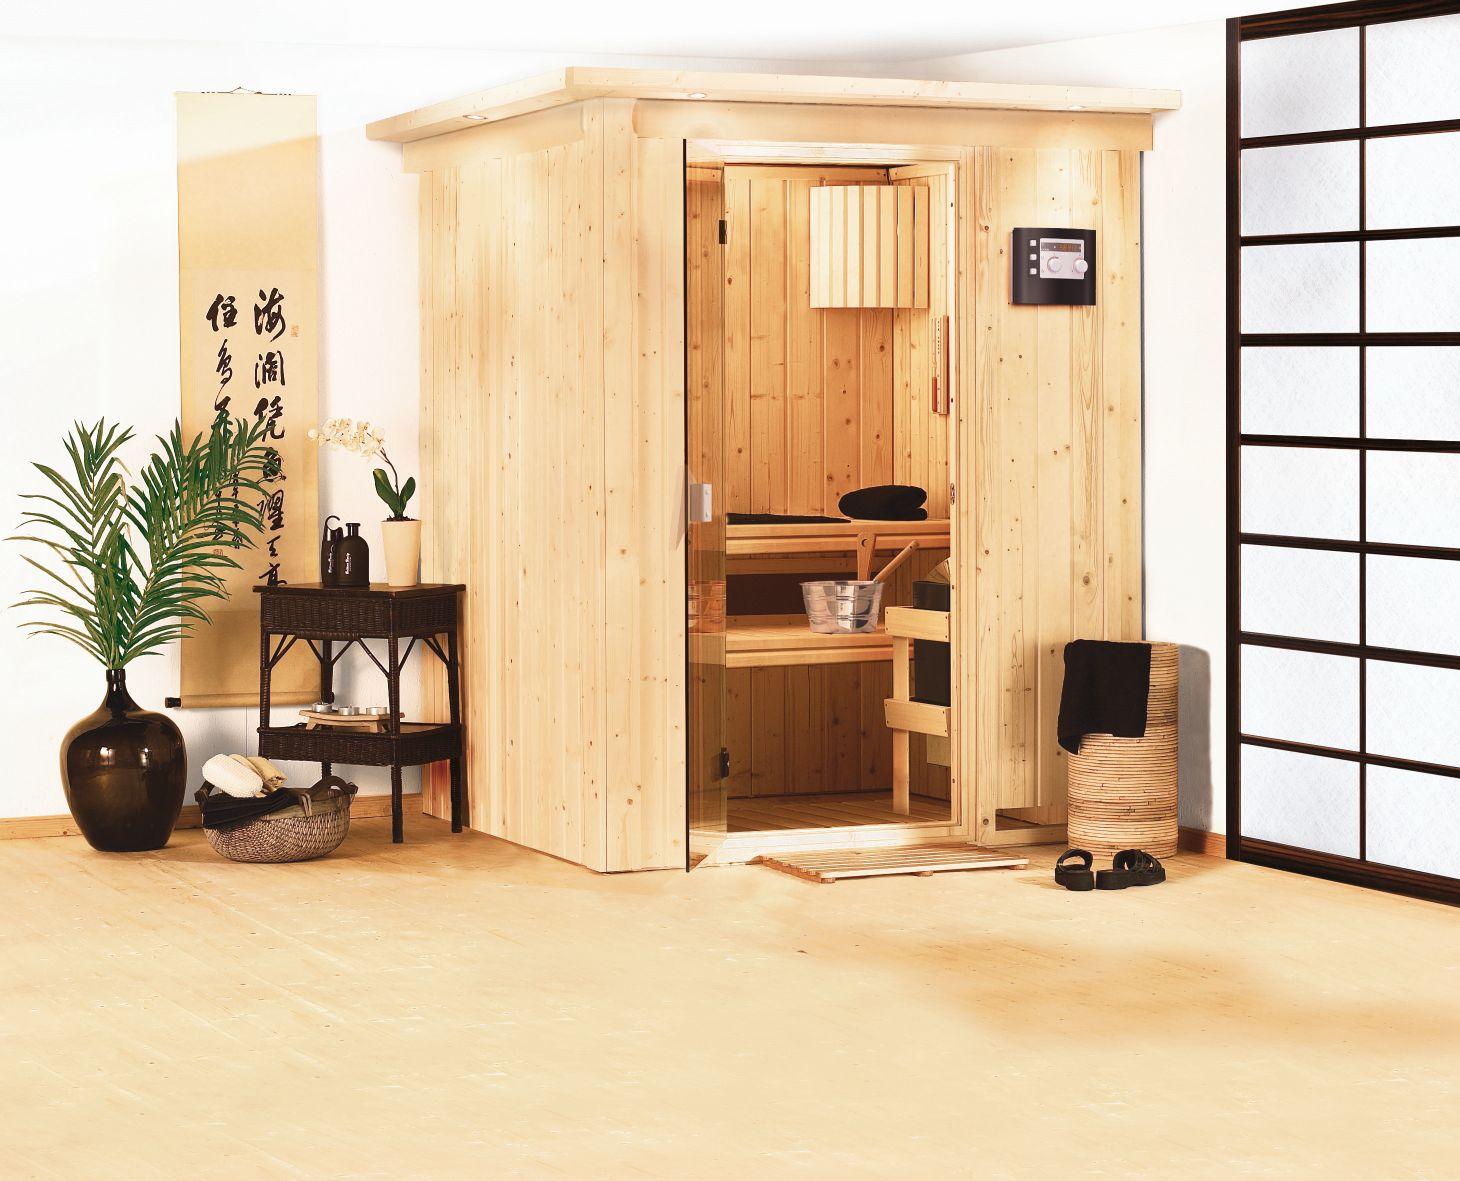 sauna finlandesa mar n piscinas athena. Black Bedroom Furniture Sets. Home Design Ideas